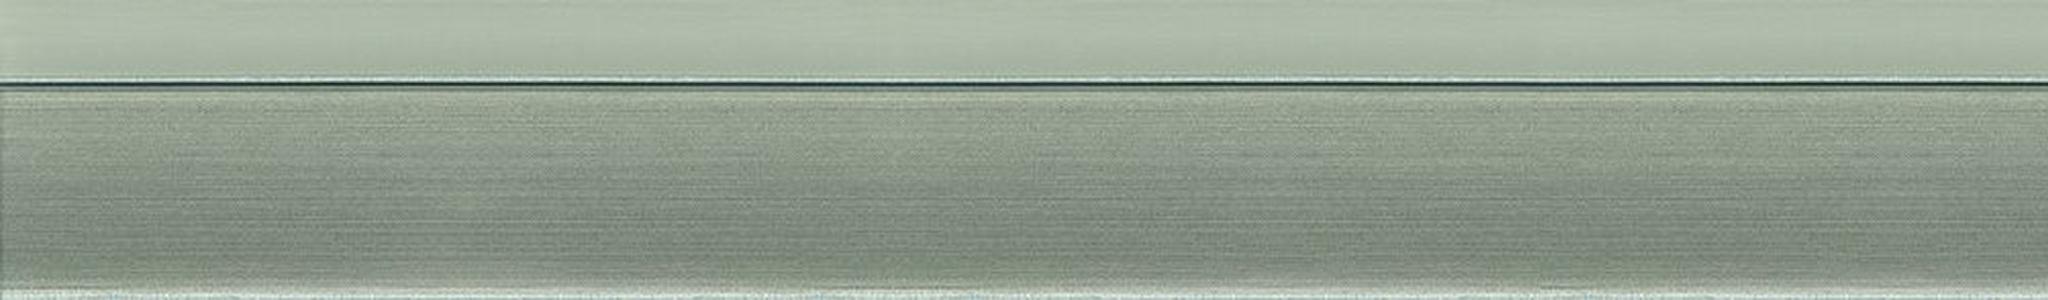 HD 29320 Akryl 3D hrana cristal gris